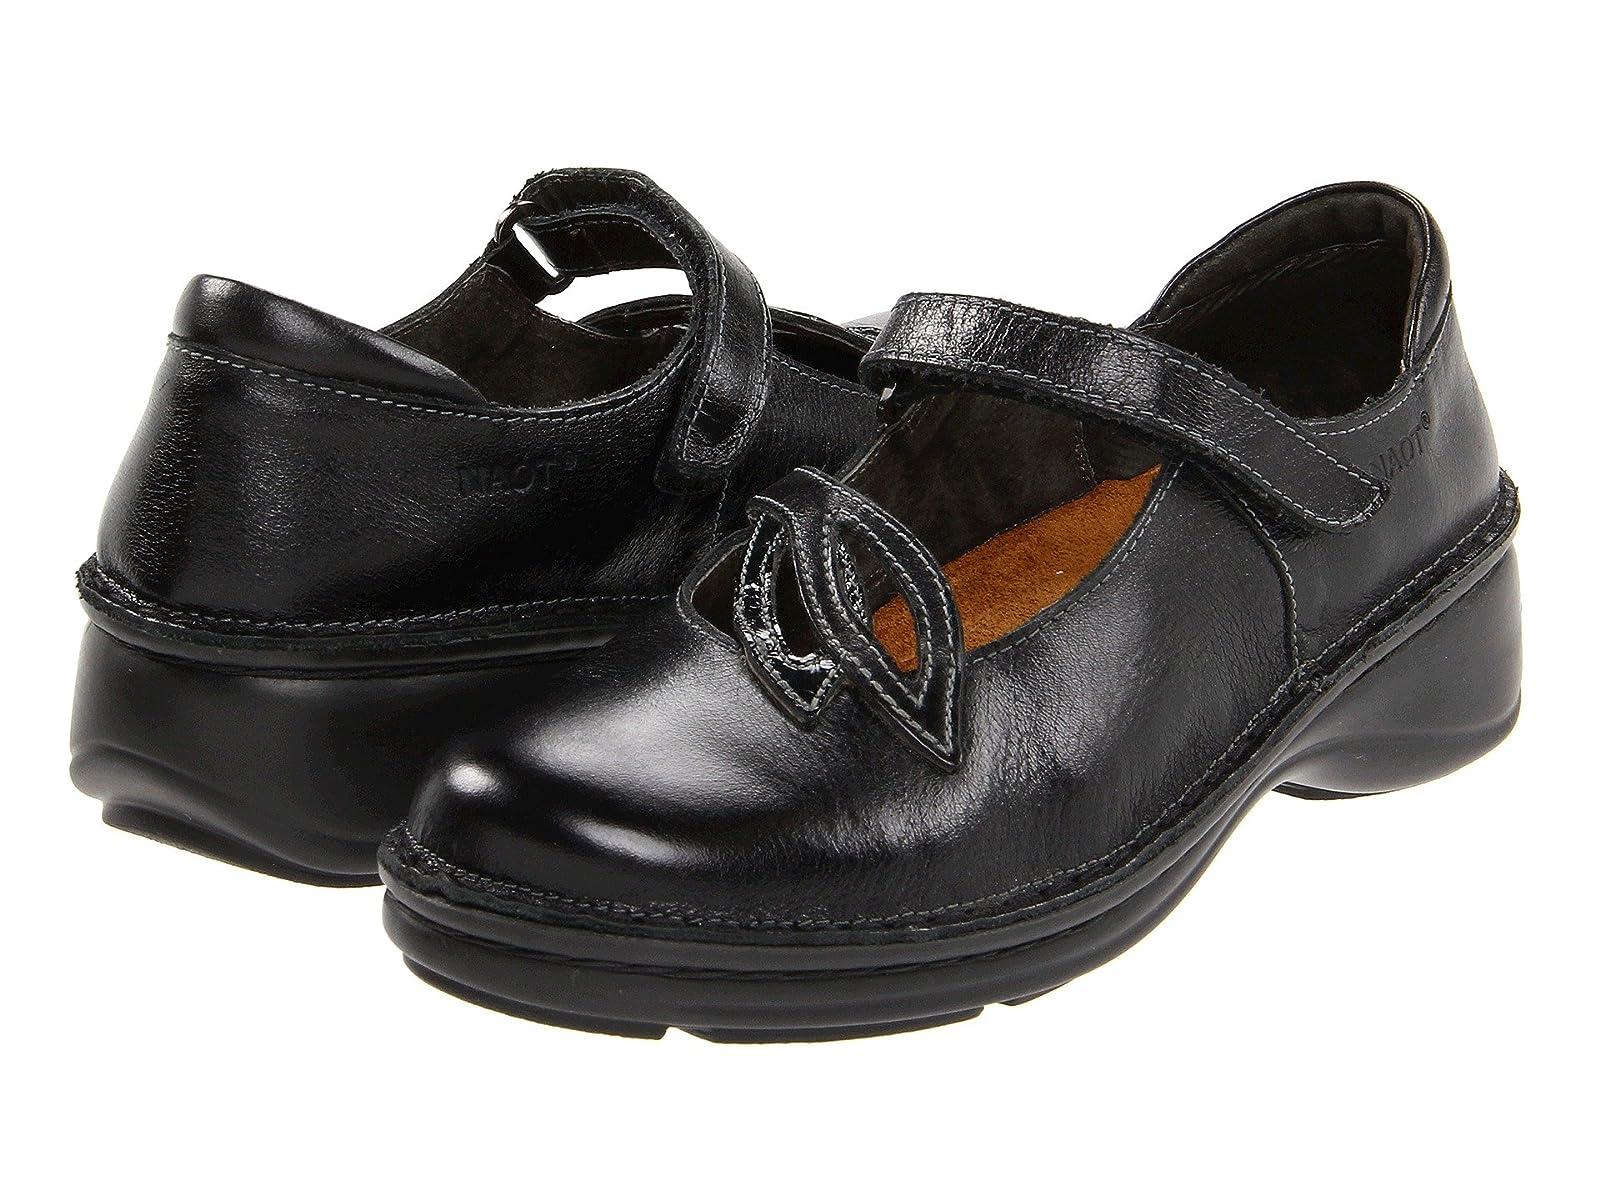 Naot PrimroseAtmospheric grades have affordable shoes